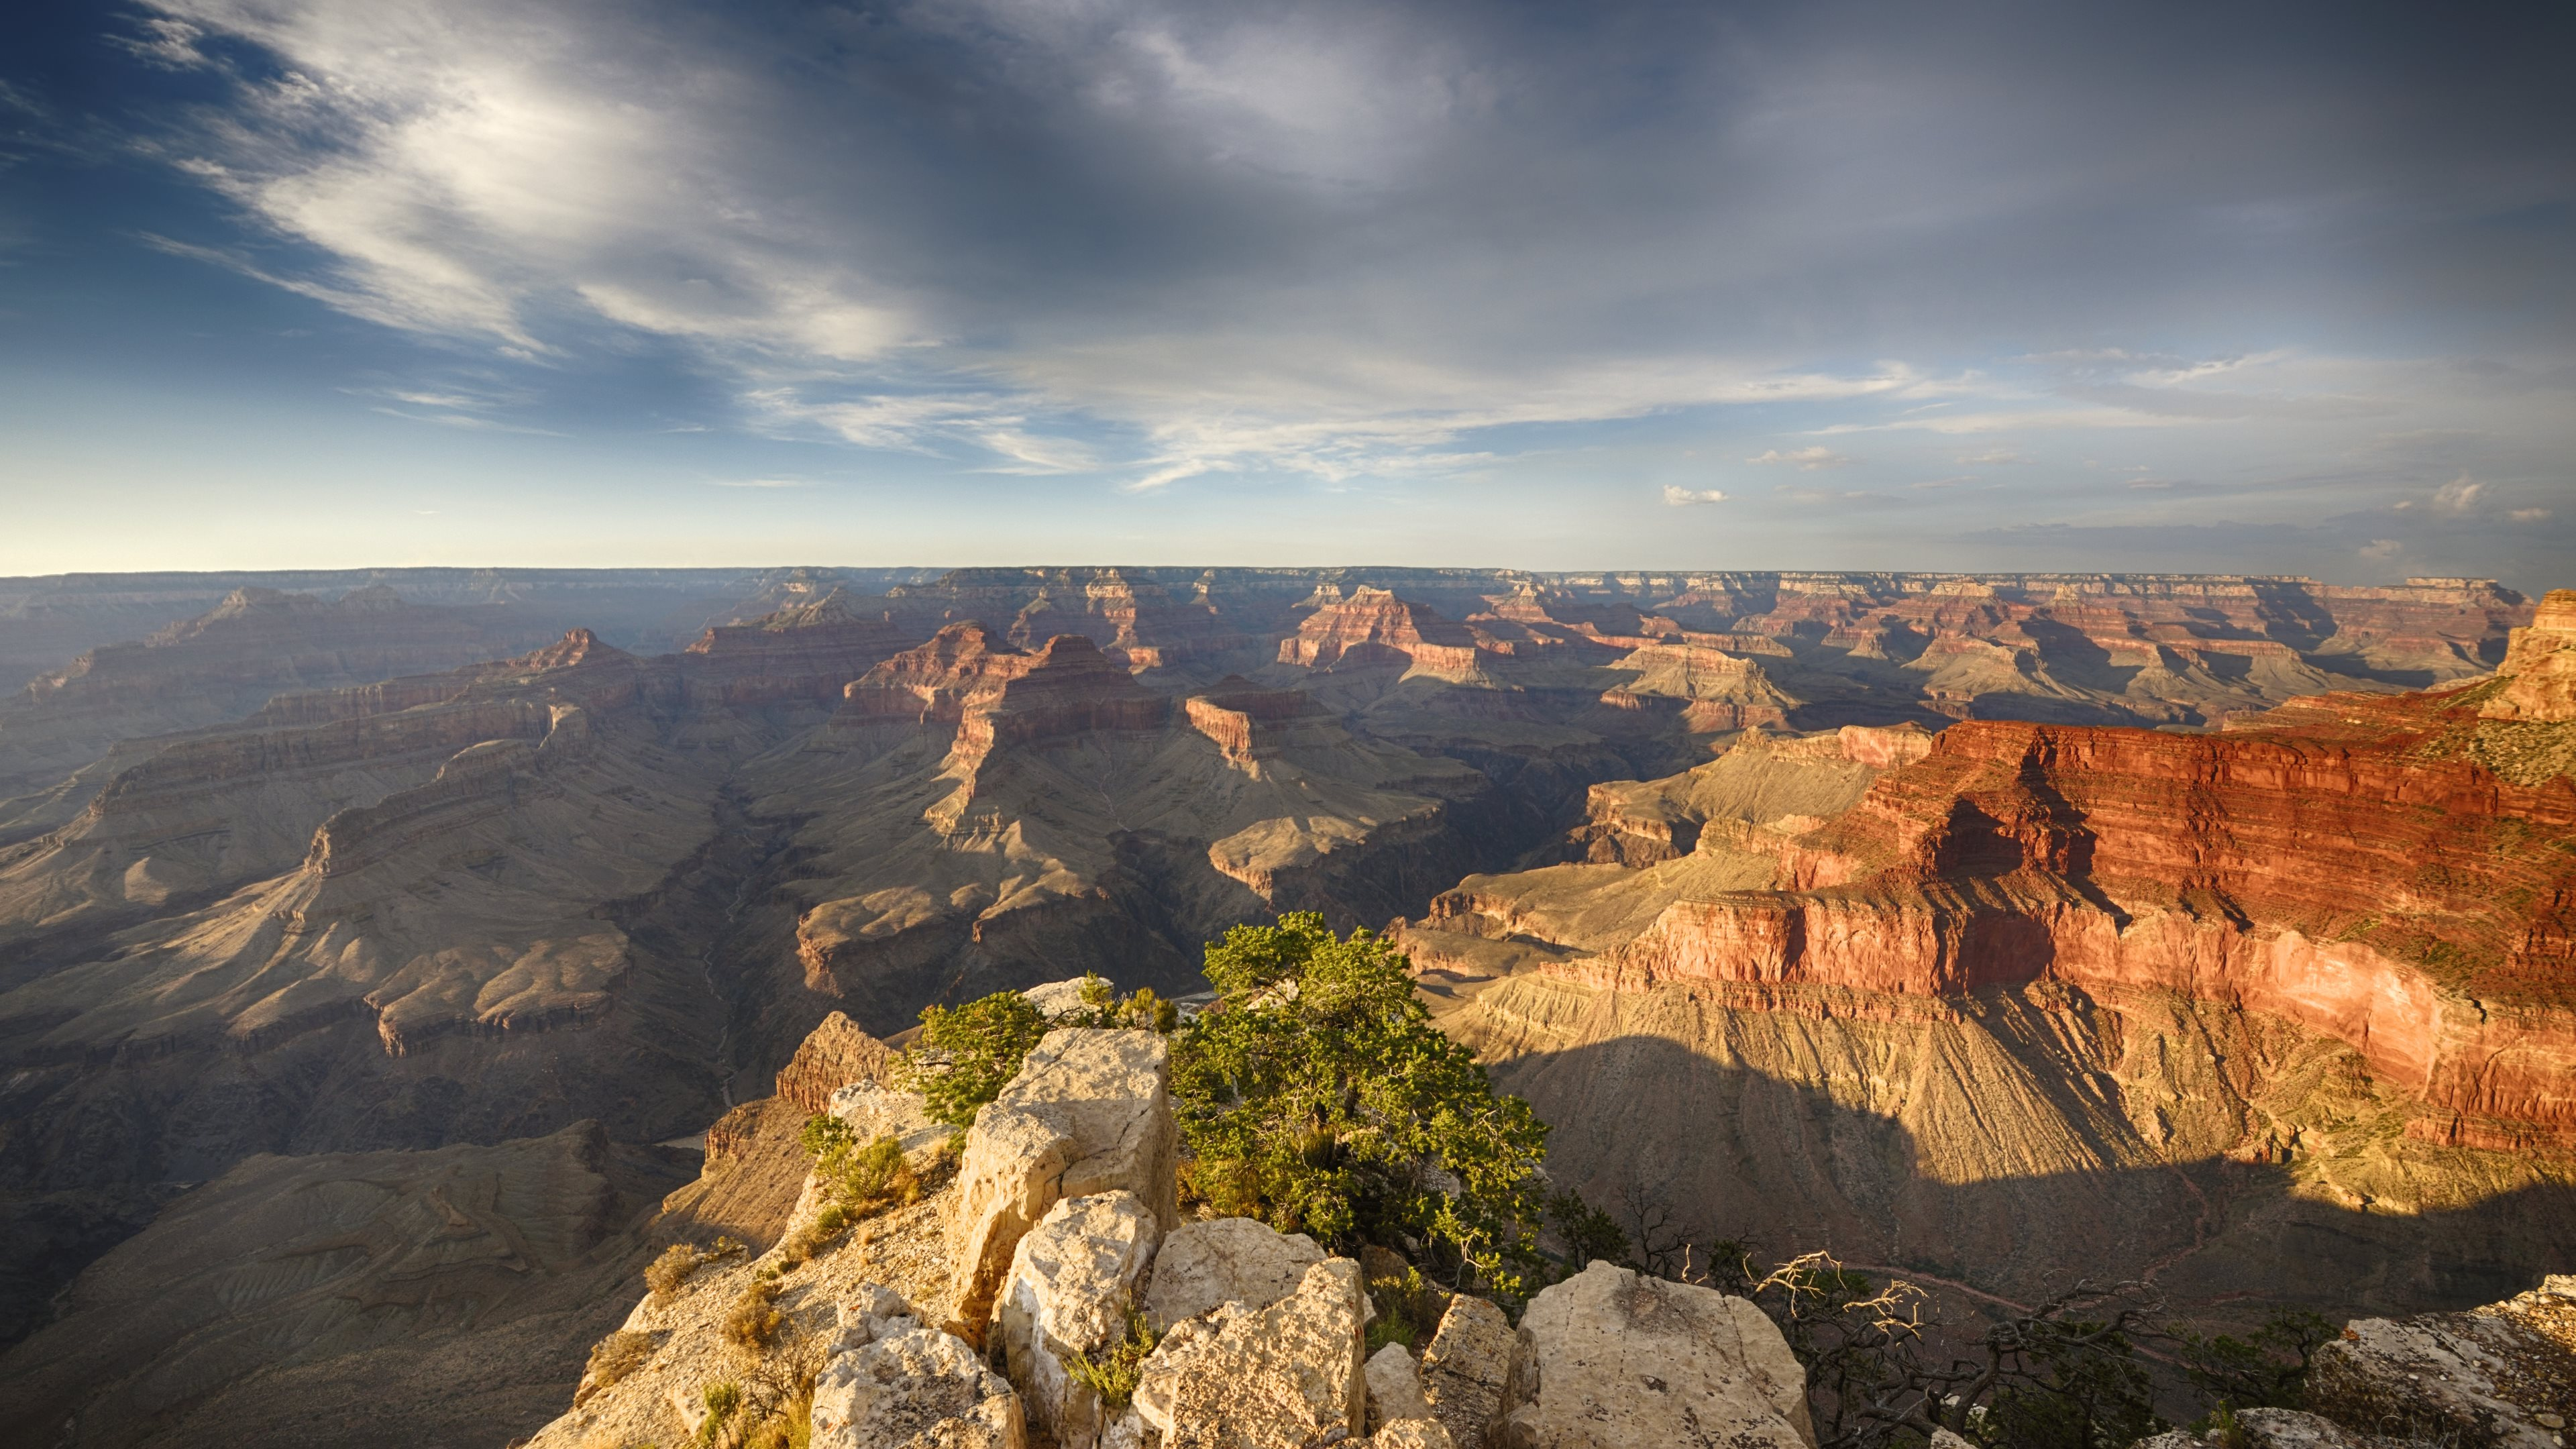 Best 47 Canyon Wallpaper on HipWallpaper Grand Canyon Lightning 3840x2160